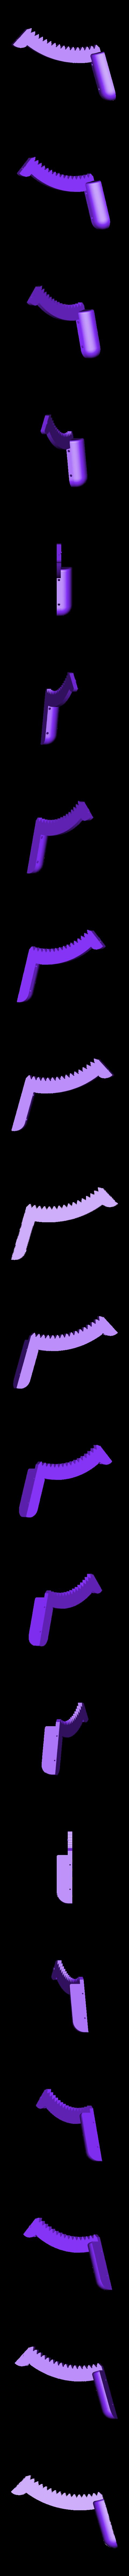 Spirograph _ Prusament Spool_by Dominik Cisar_004.stl Download free STL file SPIROGRAPH - PRUSAMENT SPOOL - reuse idea • 3D print model, cisardom